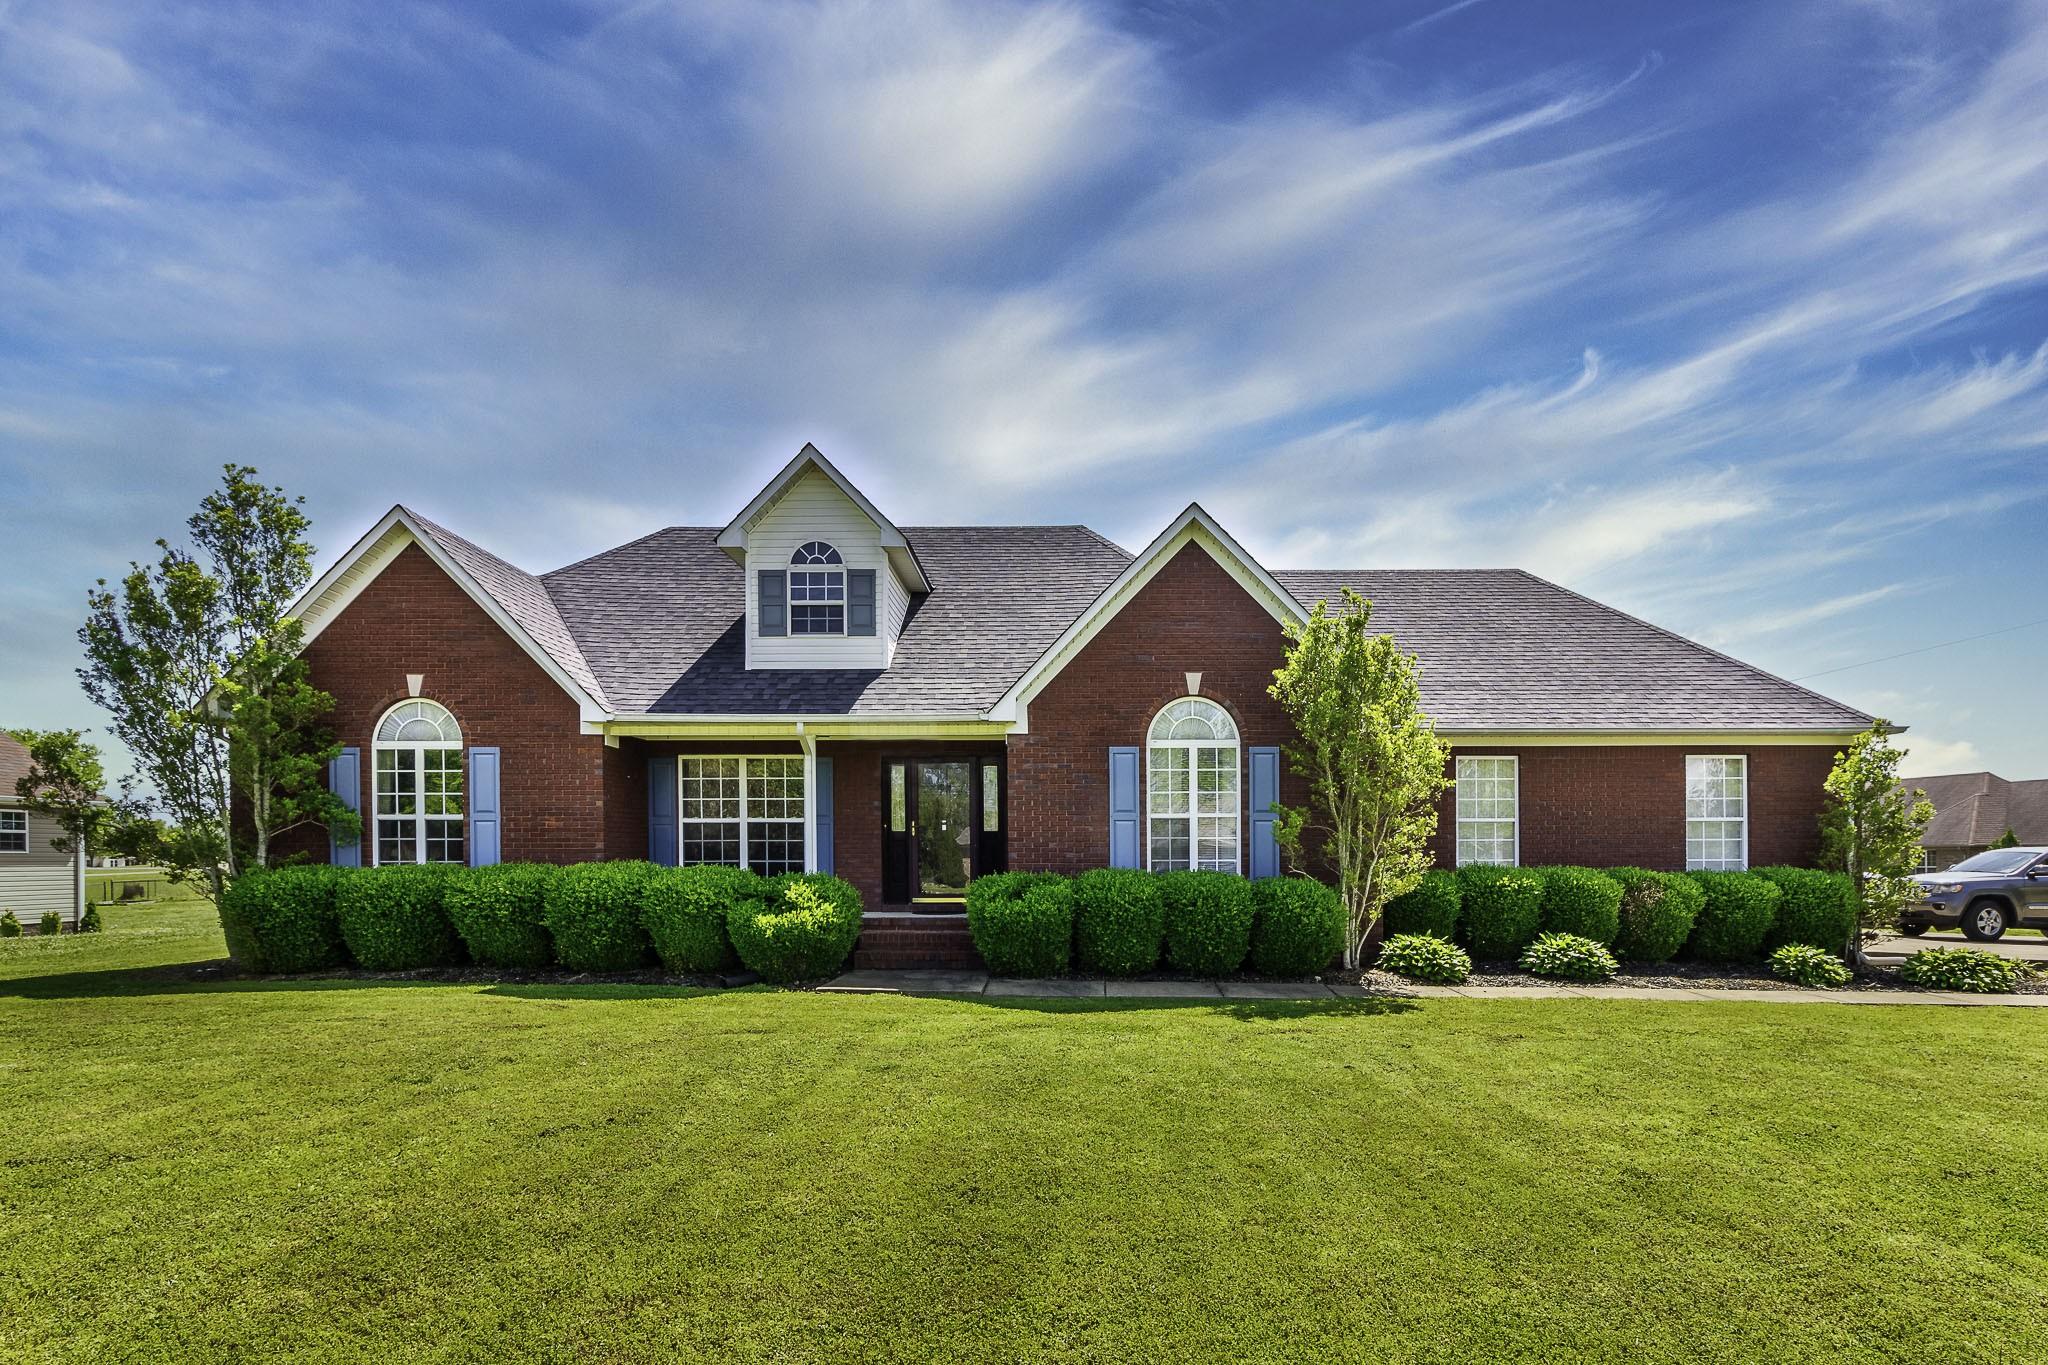 57 Balee Dr Property Photo - Ethridge, TN real estate listing